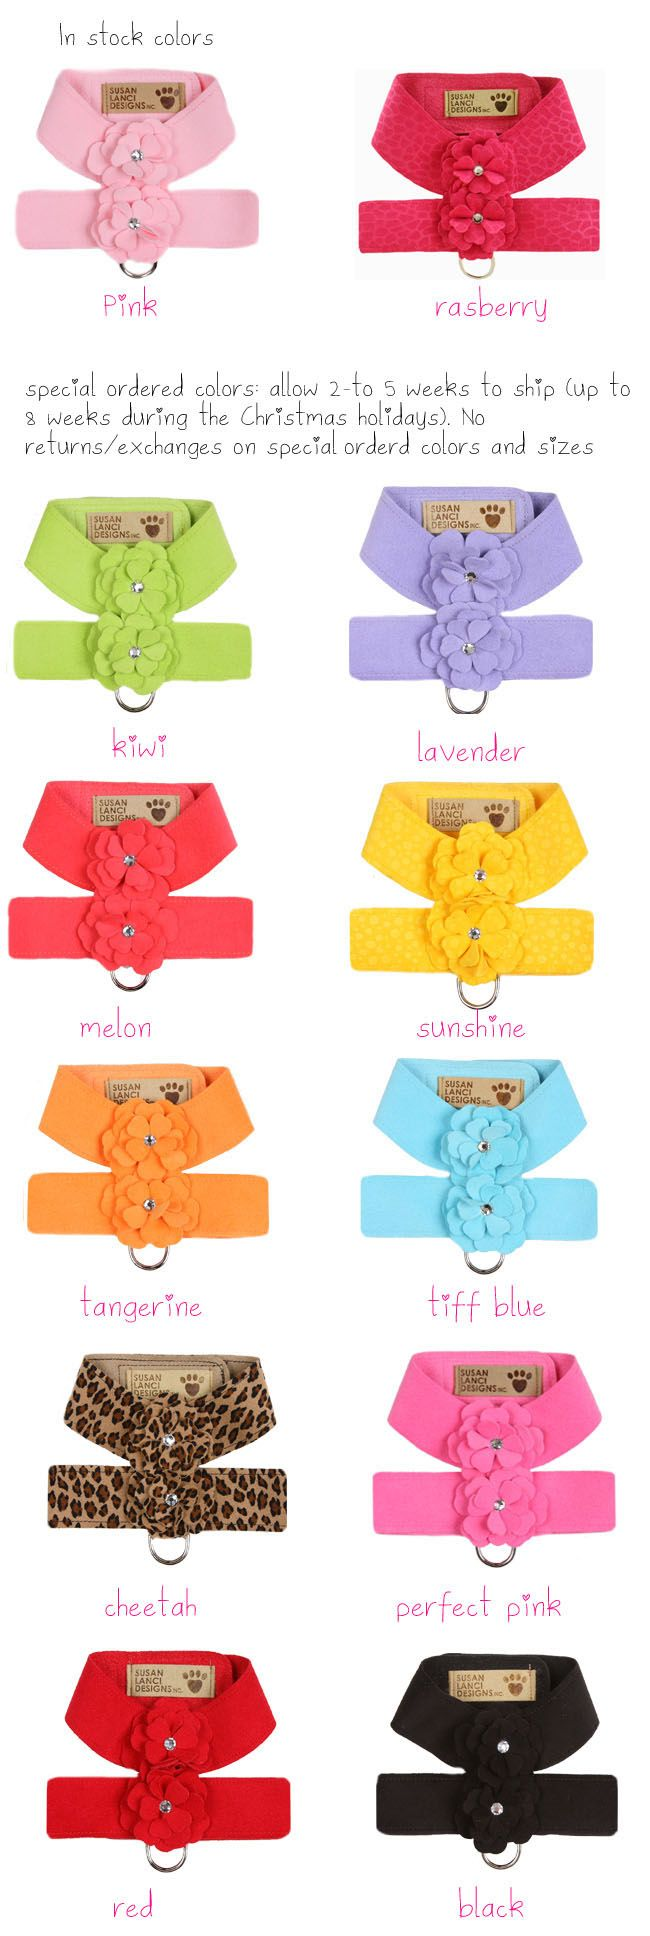 Fancy Dog Harness and Leash, Designer Dog Harness, Crystal Pet Harness, Flower Harness For Dogs Online Dog Boutique